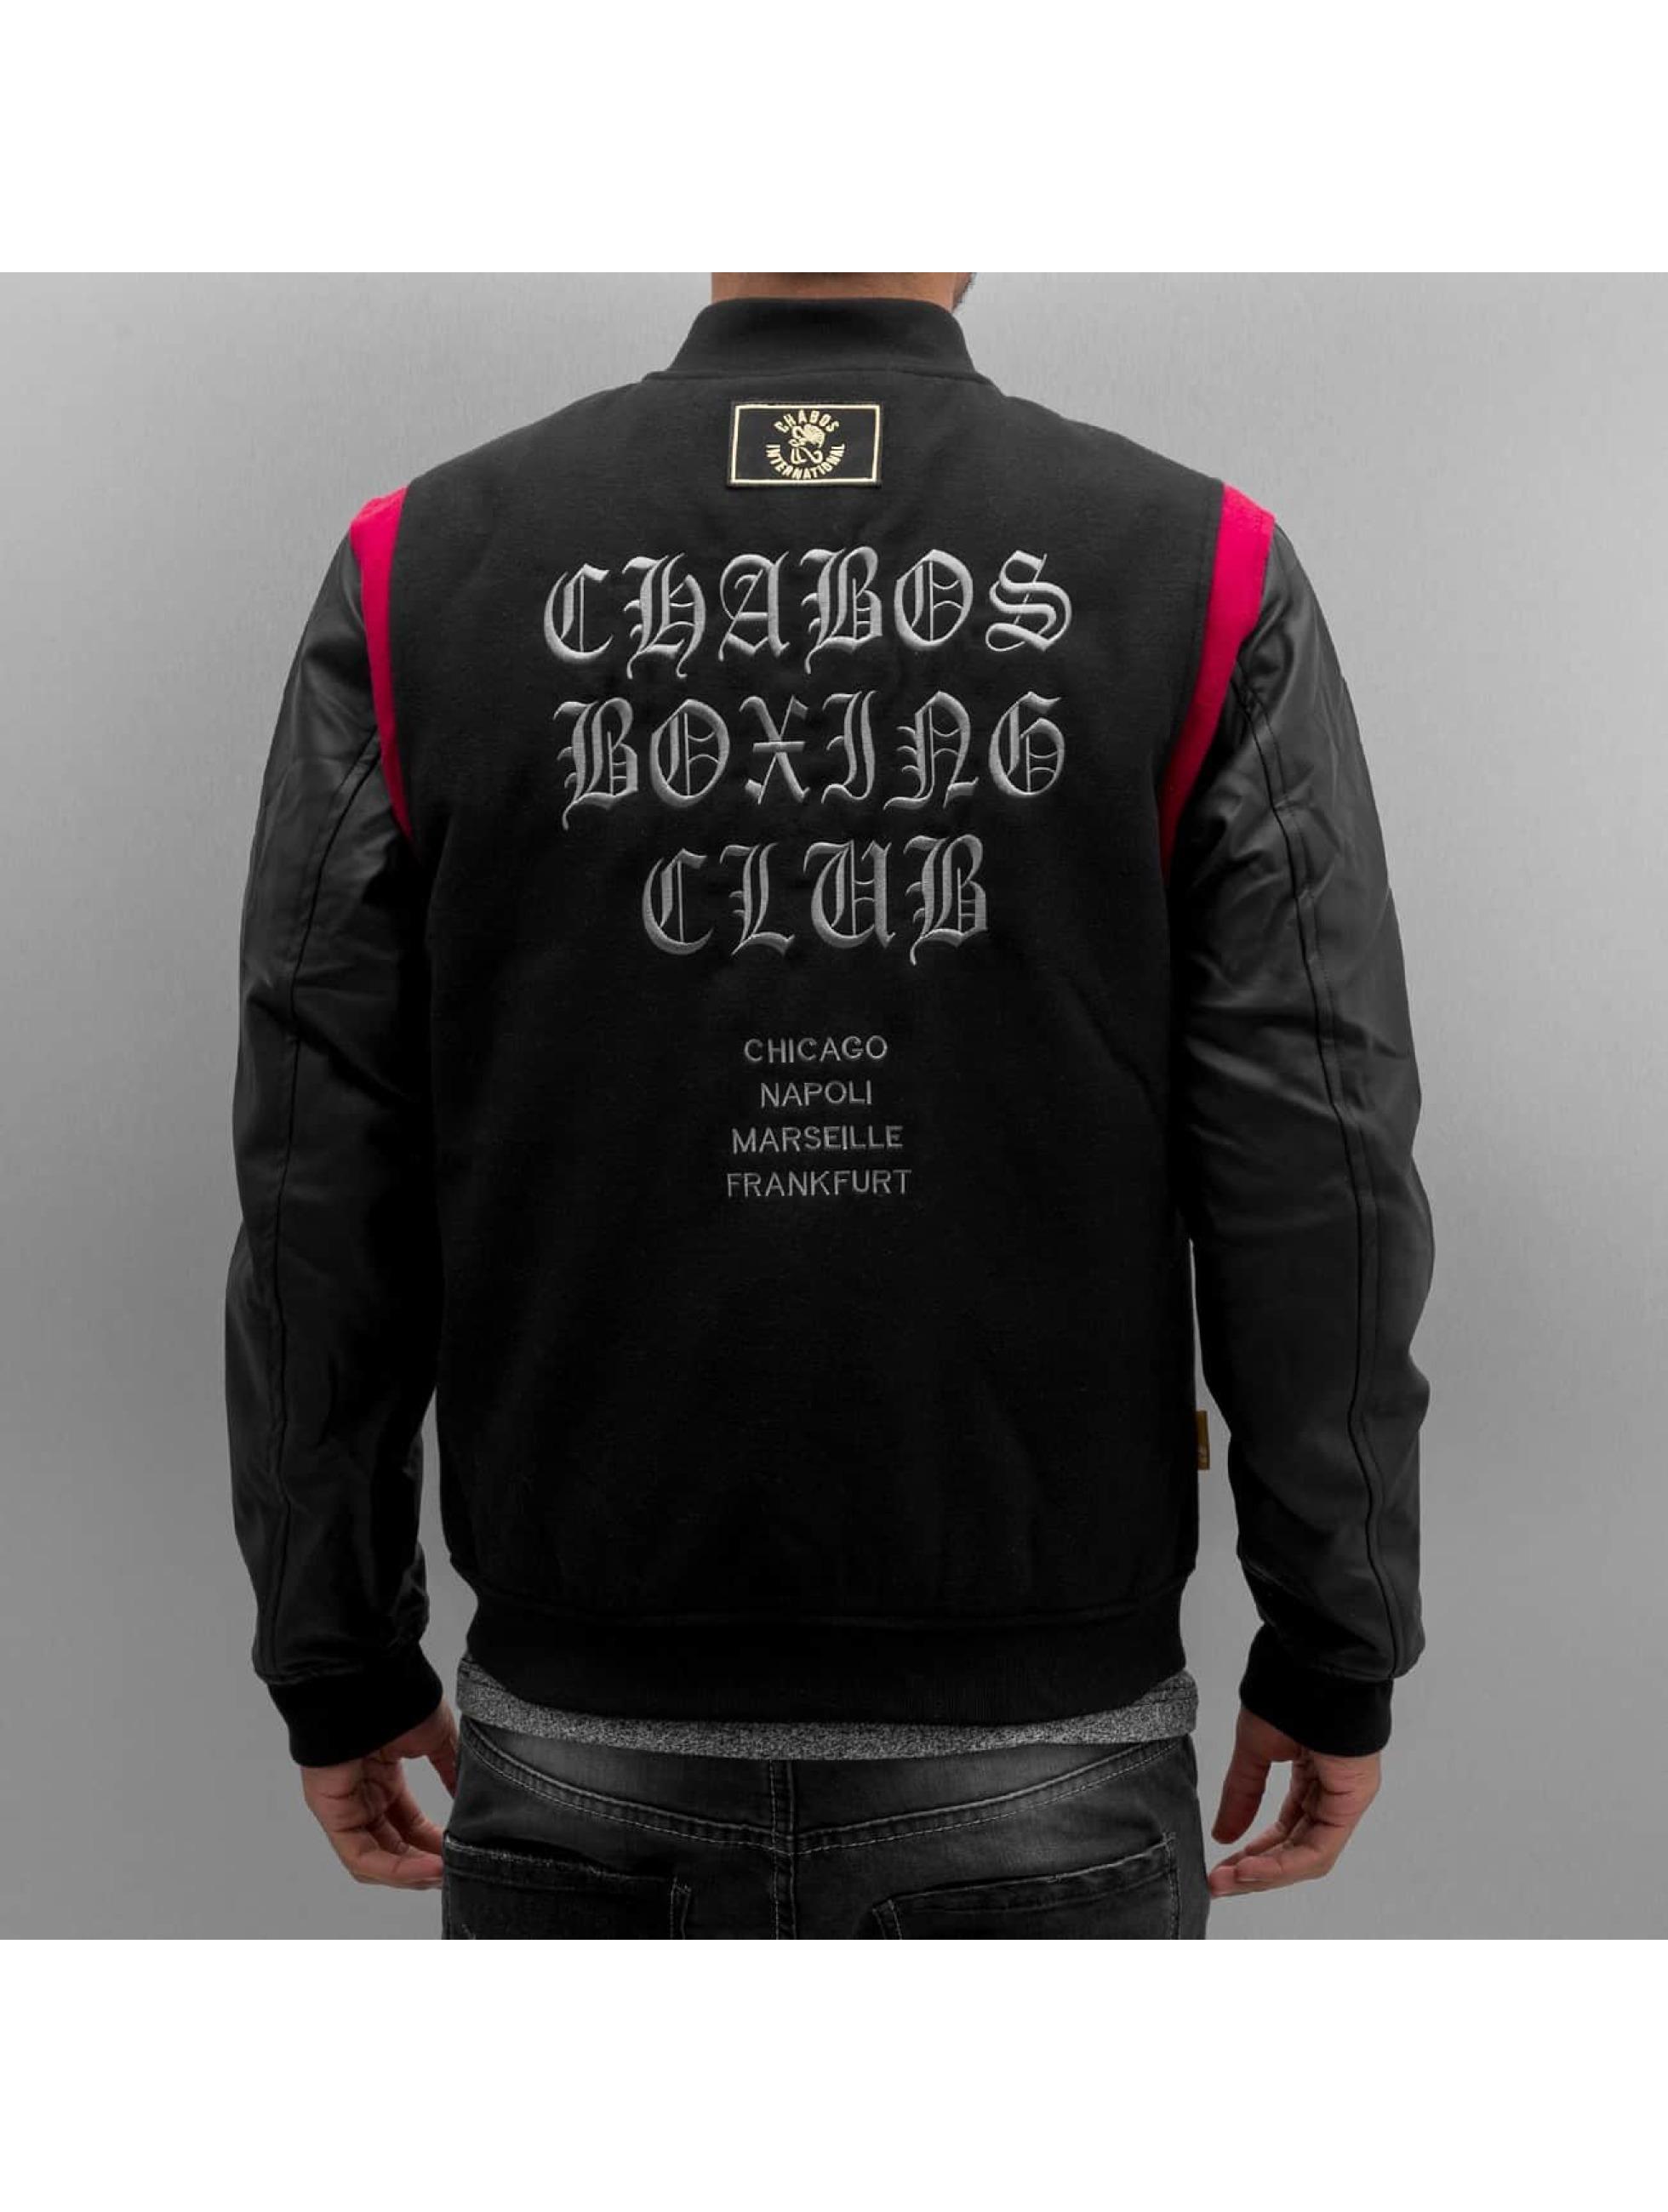 CHABOS IIVII College Jackets CBC czarny